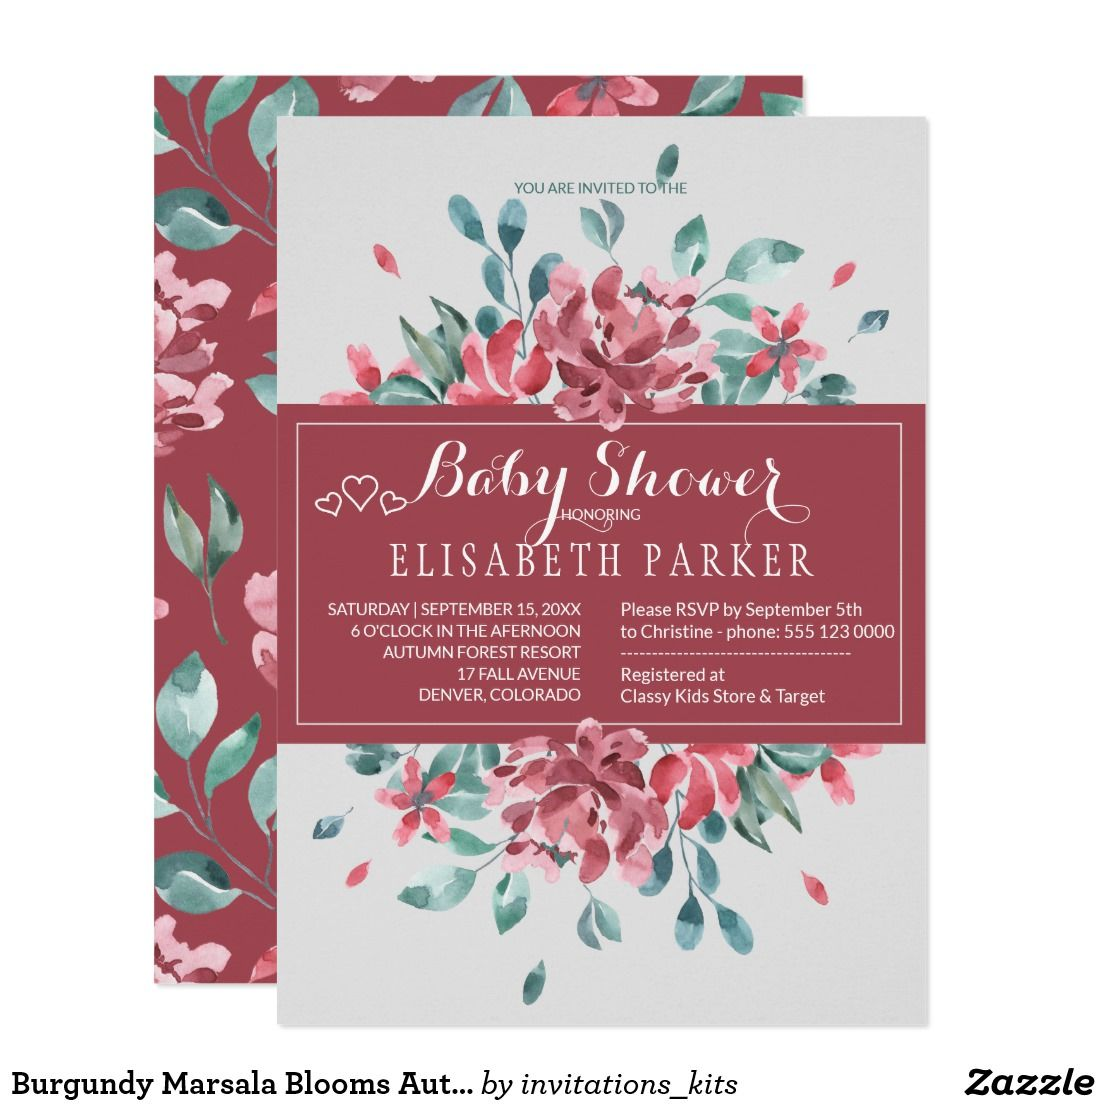 Burgundy Marsala Blooms Autumn Baby Shower Invitation   Babies and ...